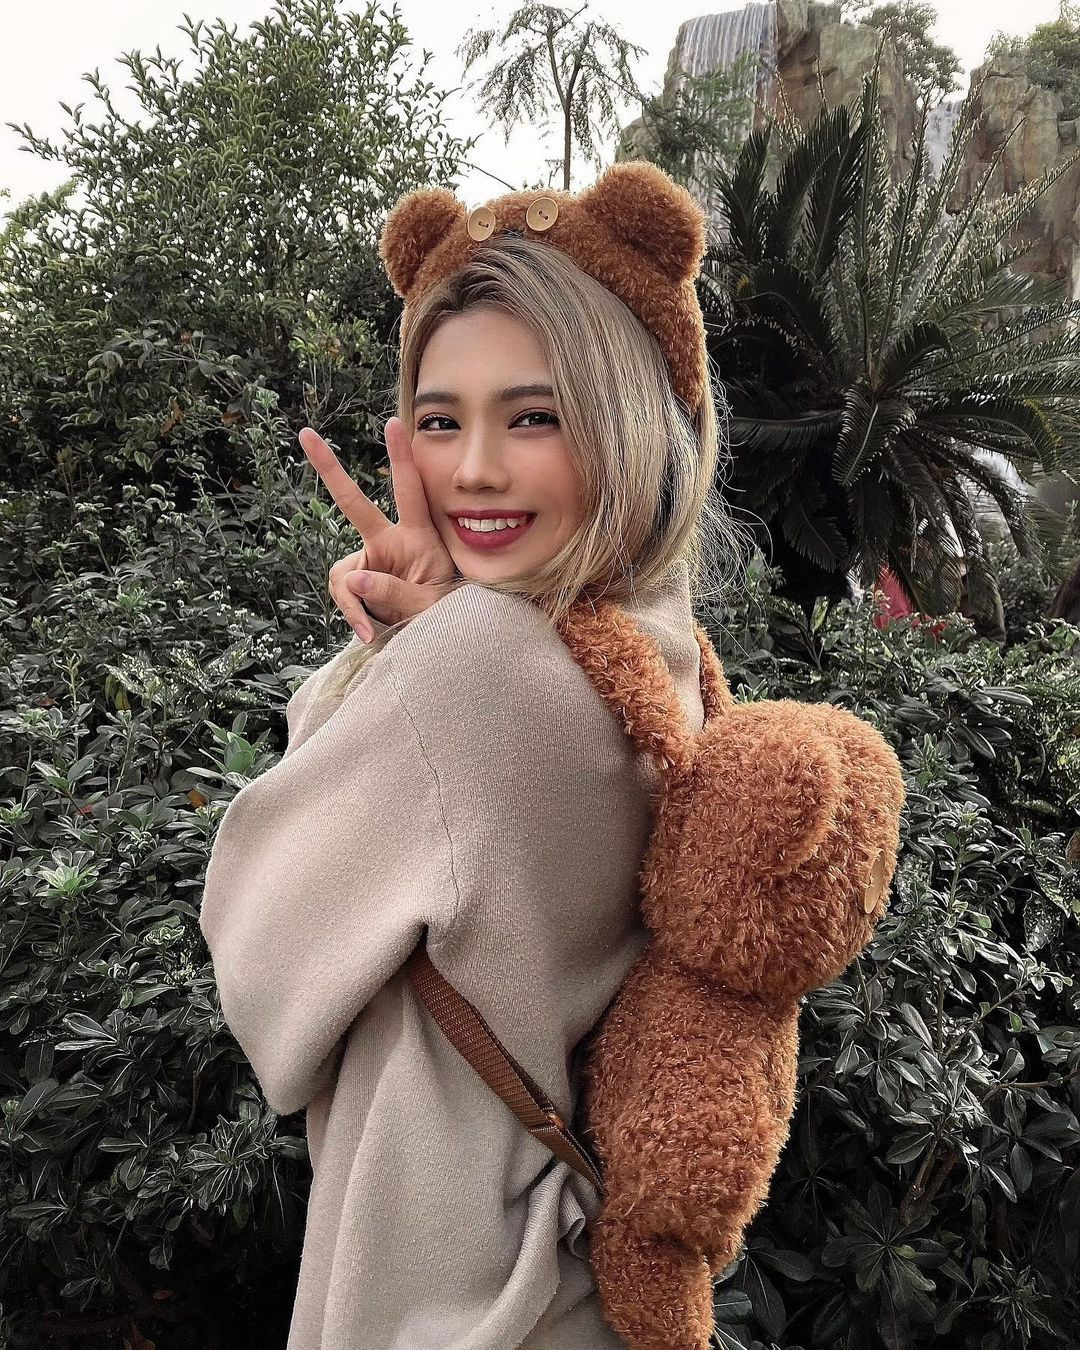 【6upoker】日本女大生Mimi「超龄脸蛋+饱满」魅力太强!爱健身还练出一对「蜜桃臀」